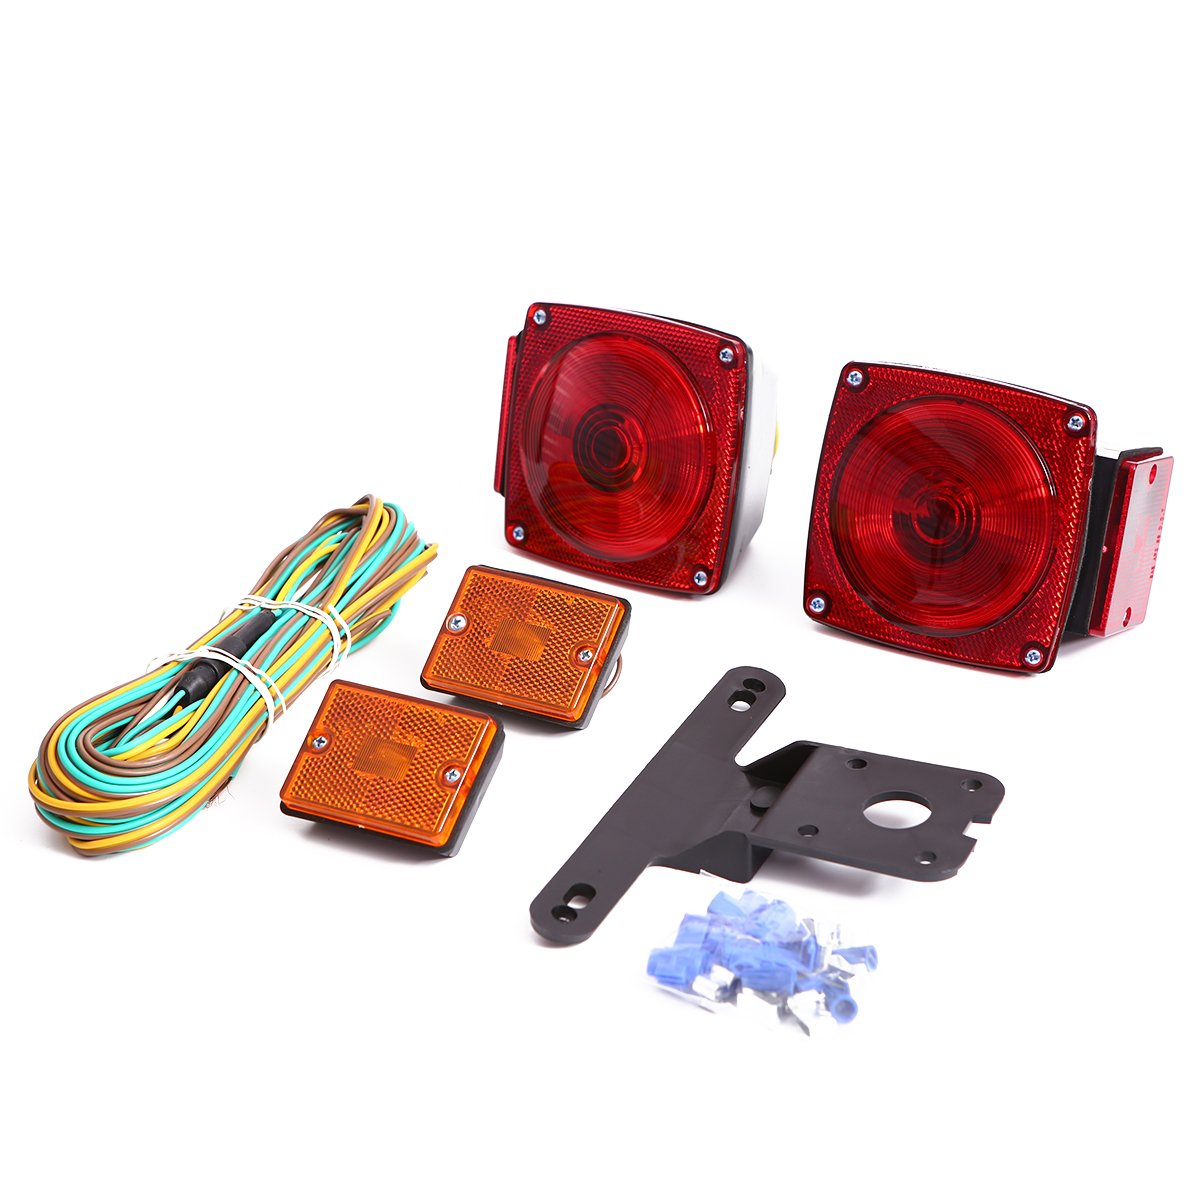 CZC AUTO Universal 12V Mount Combination Trailer Light Kit for Under 80'' Trailers Trucks RV Snowmobile